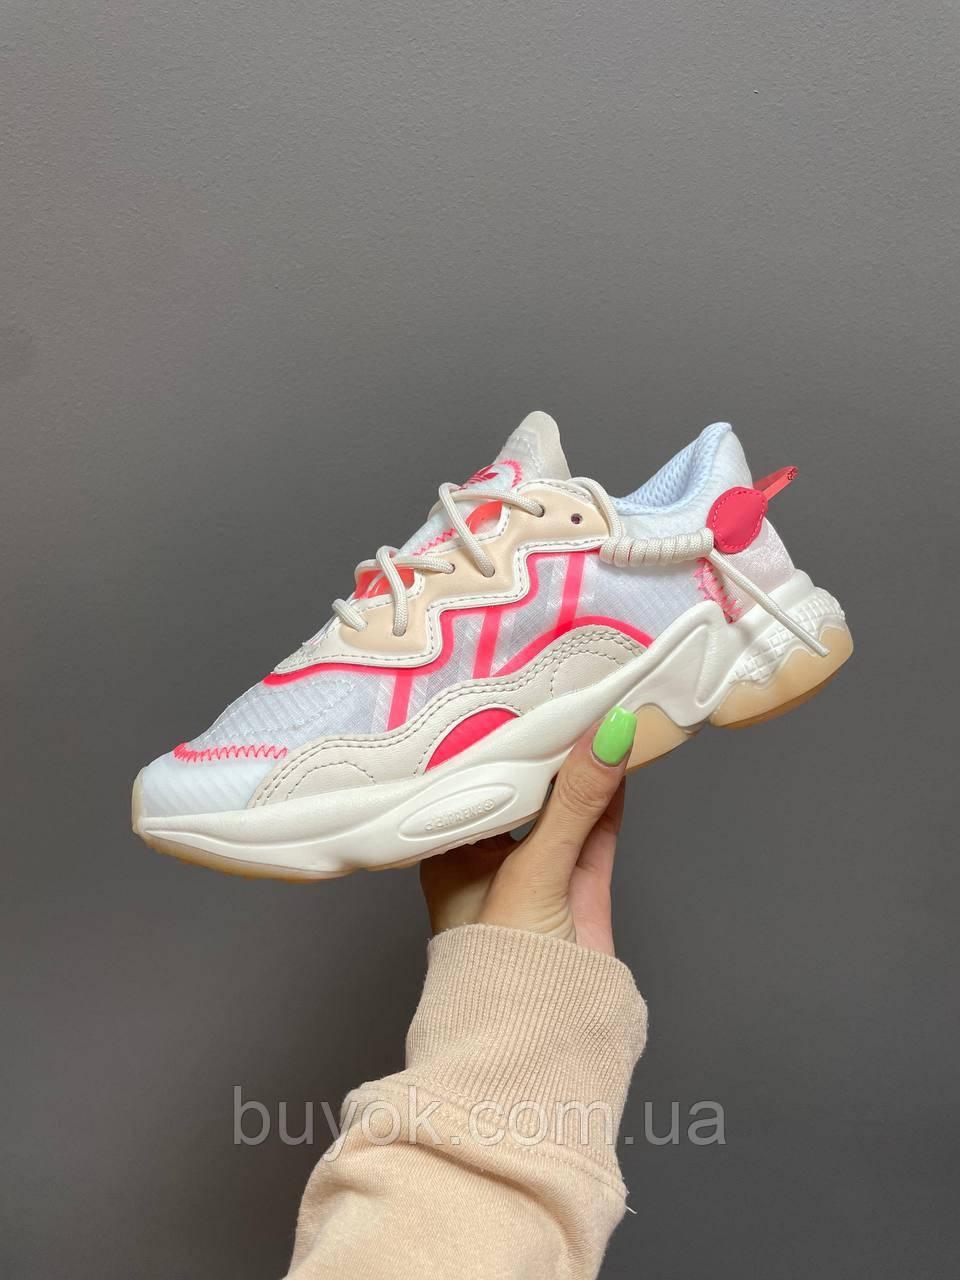 Жіночі кросівки Adidas Ozweego White Pink Beige